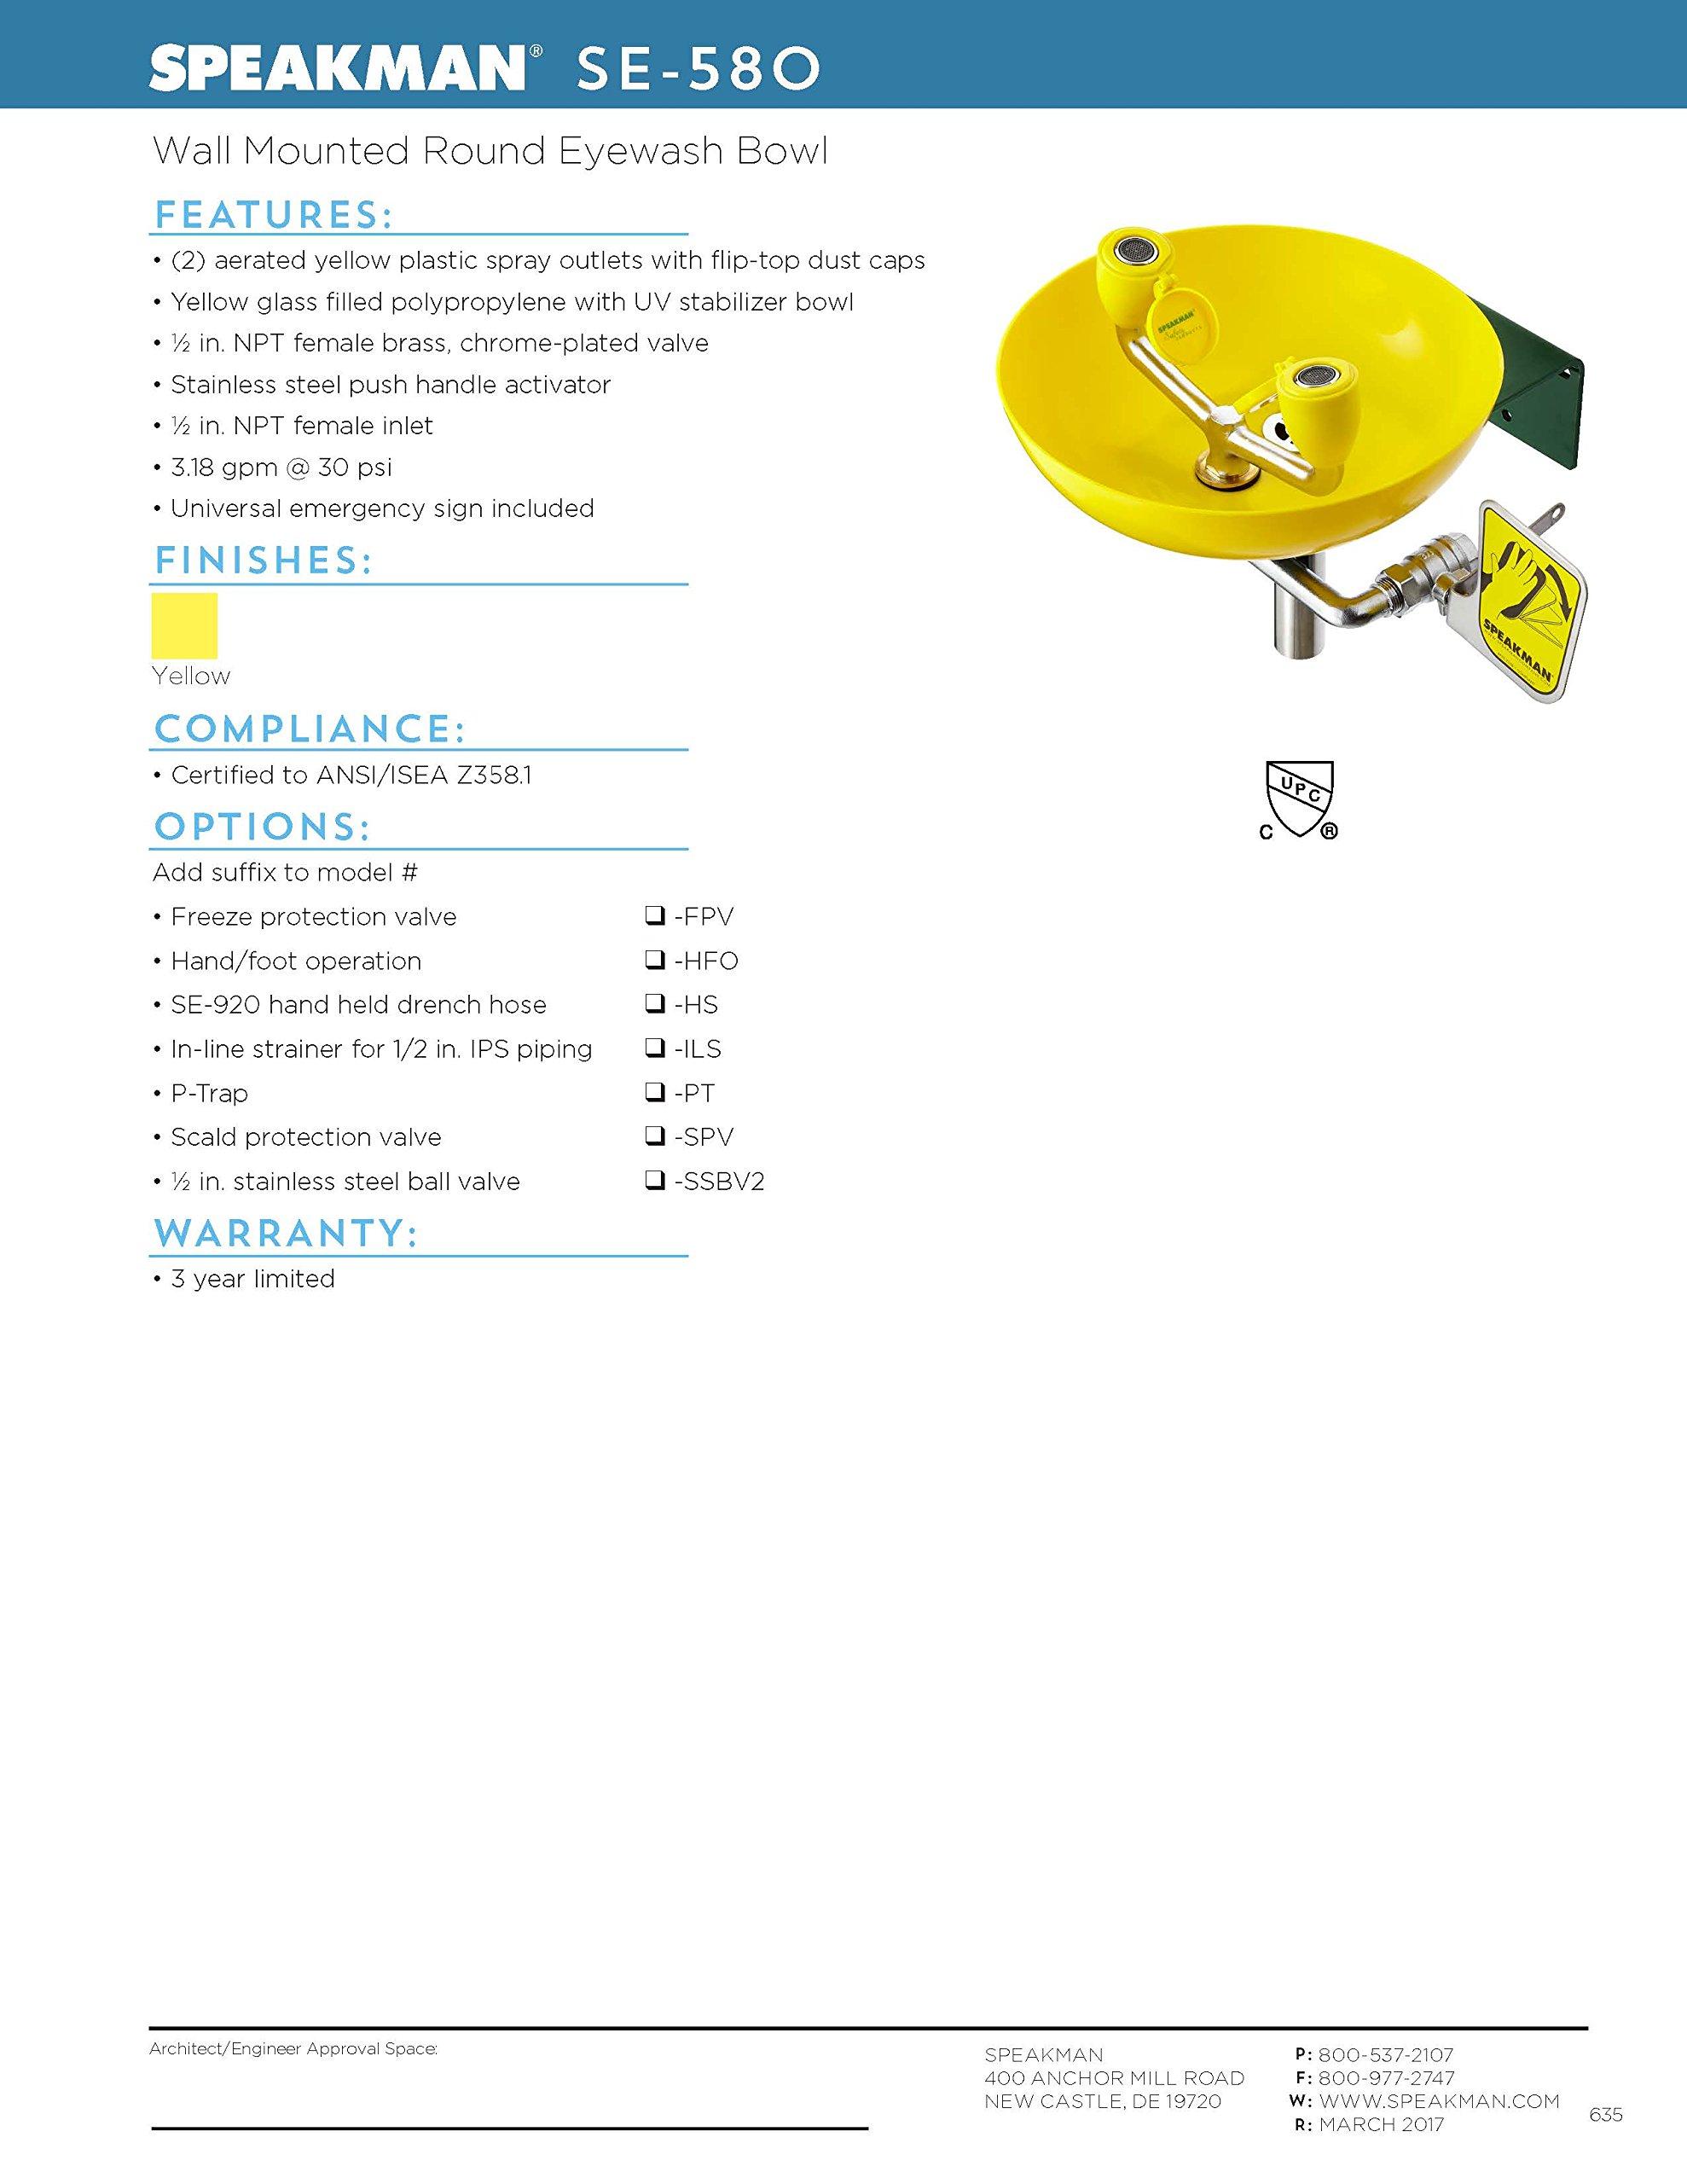 Speakman Traditional Series SE-580 Wall Mounted Eyewash with Plastic Bowl by Speakman (Image #6)